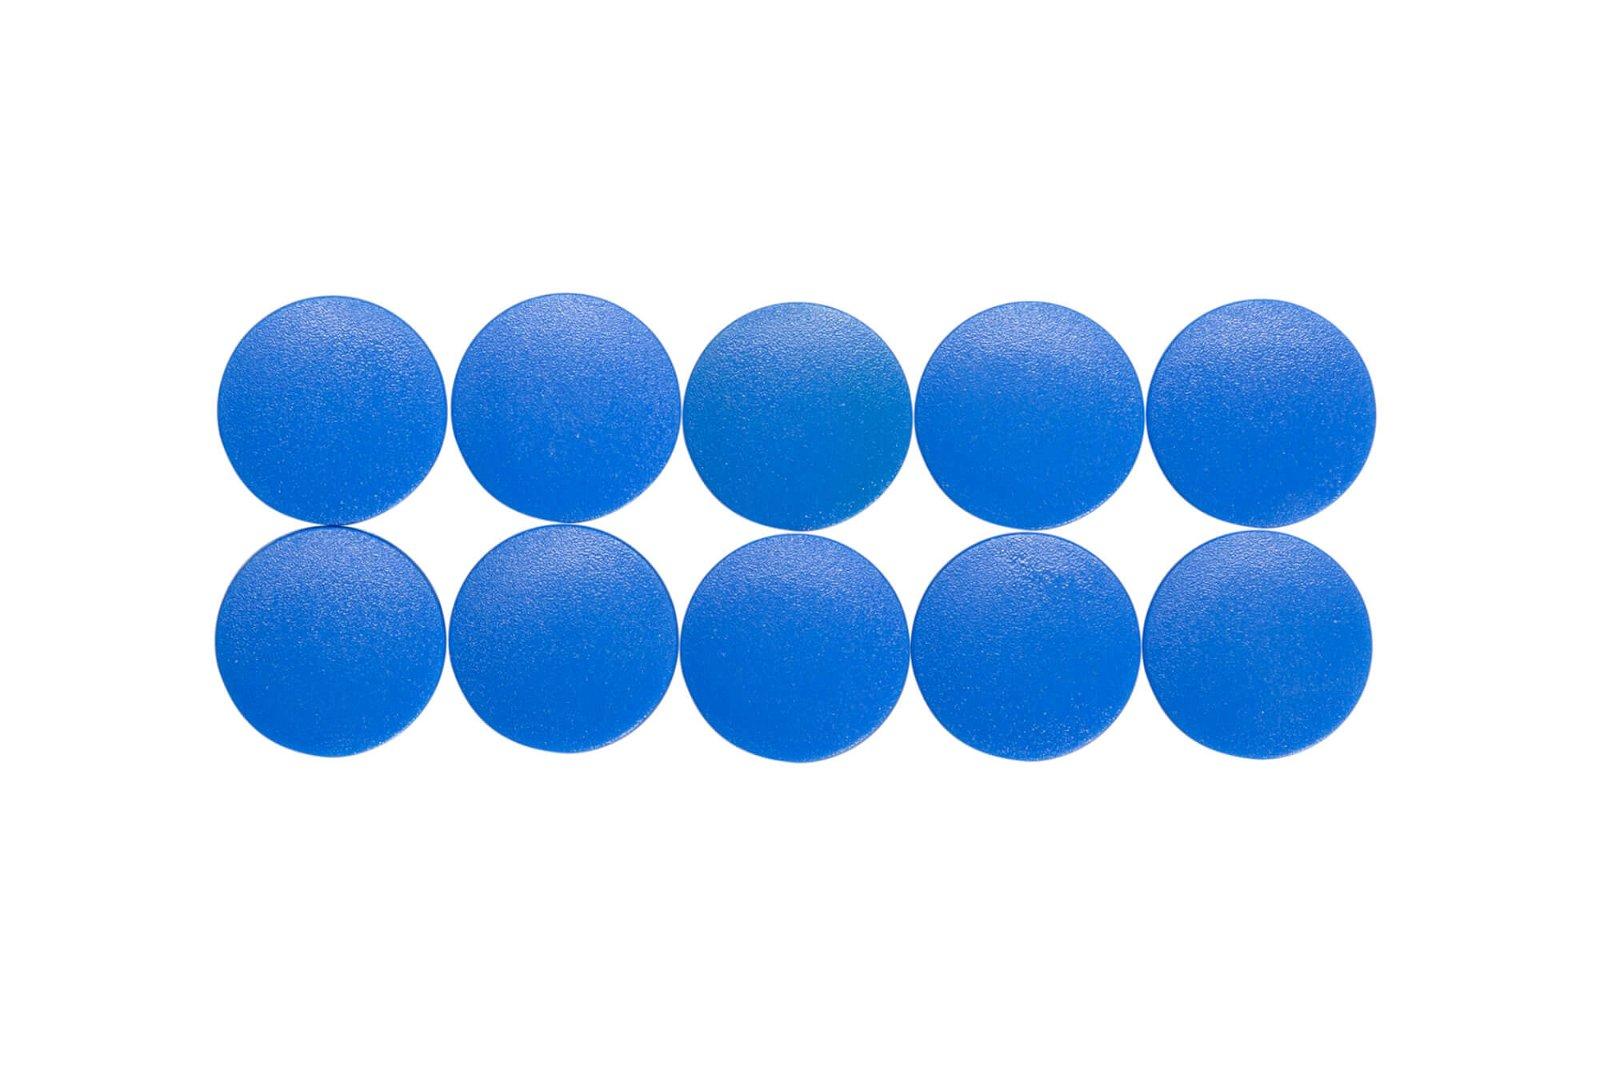 Magnet MAULsolid Ø 20 mm, 0,3 kg Haftkraft, 10 St./Ktn., blau